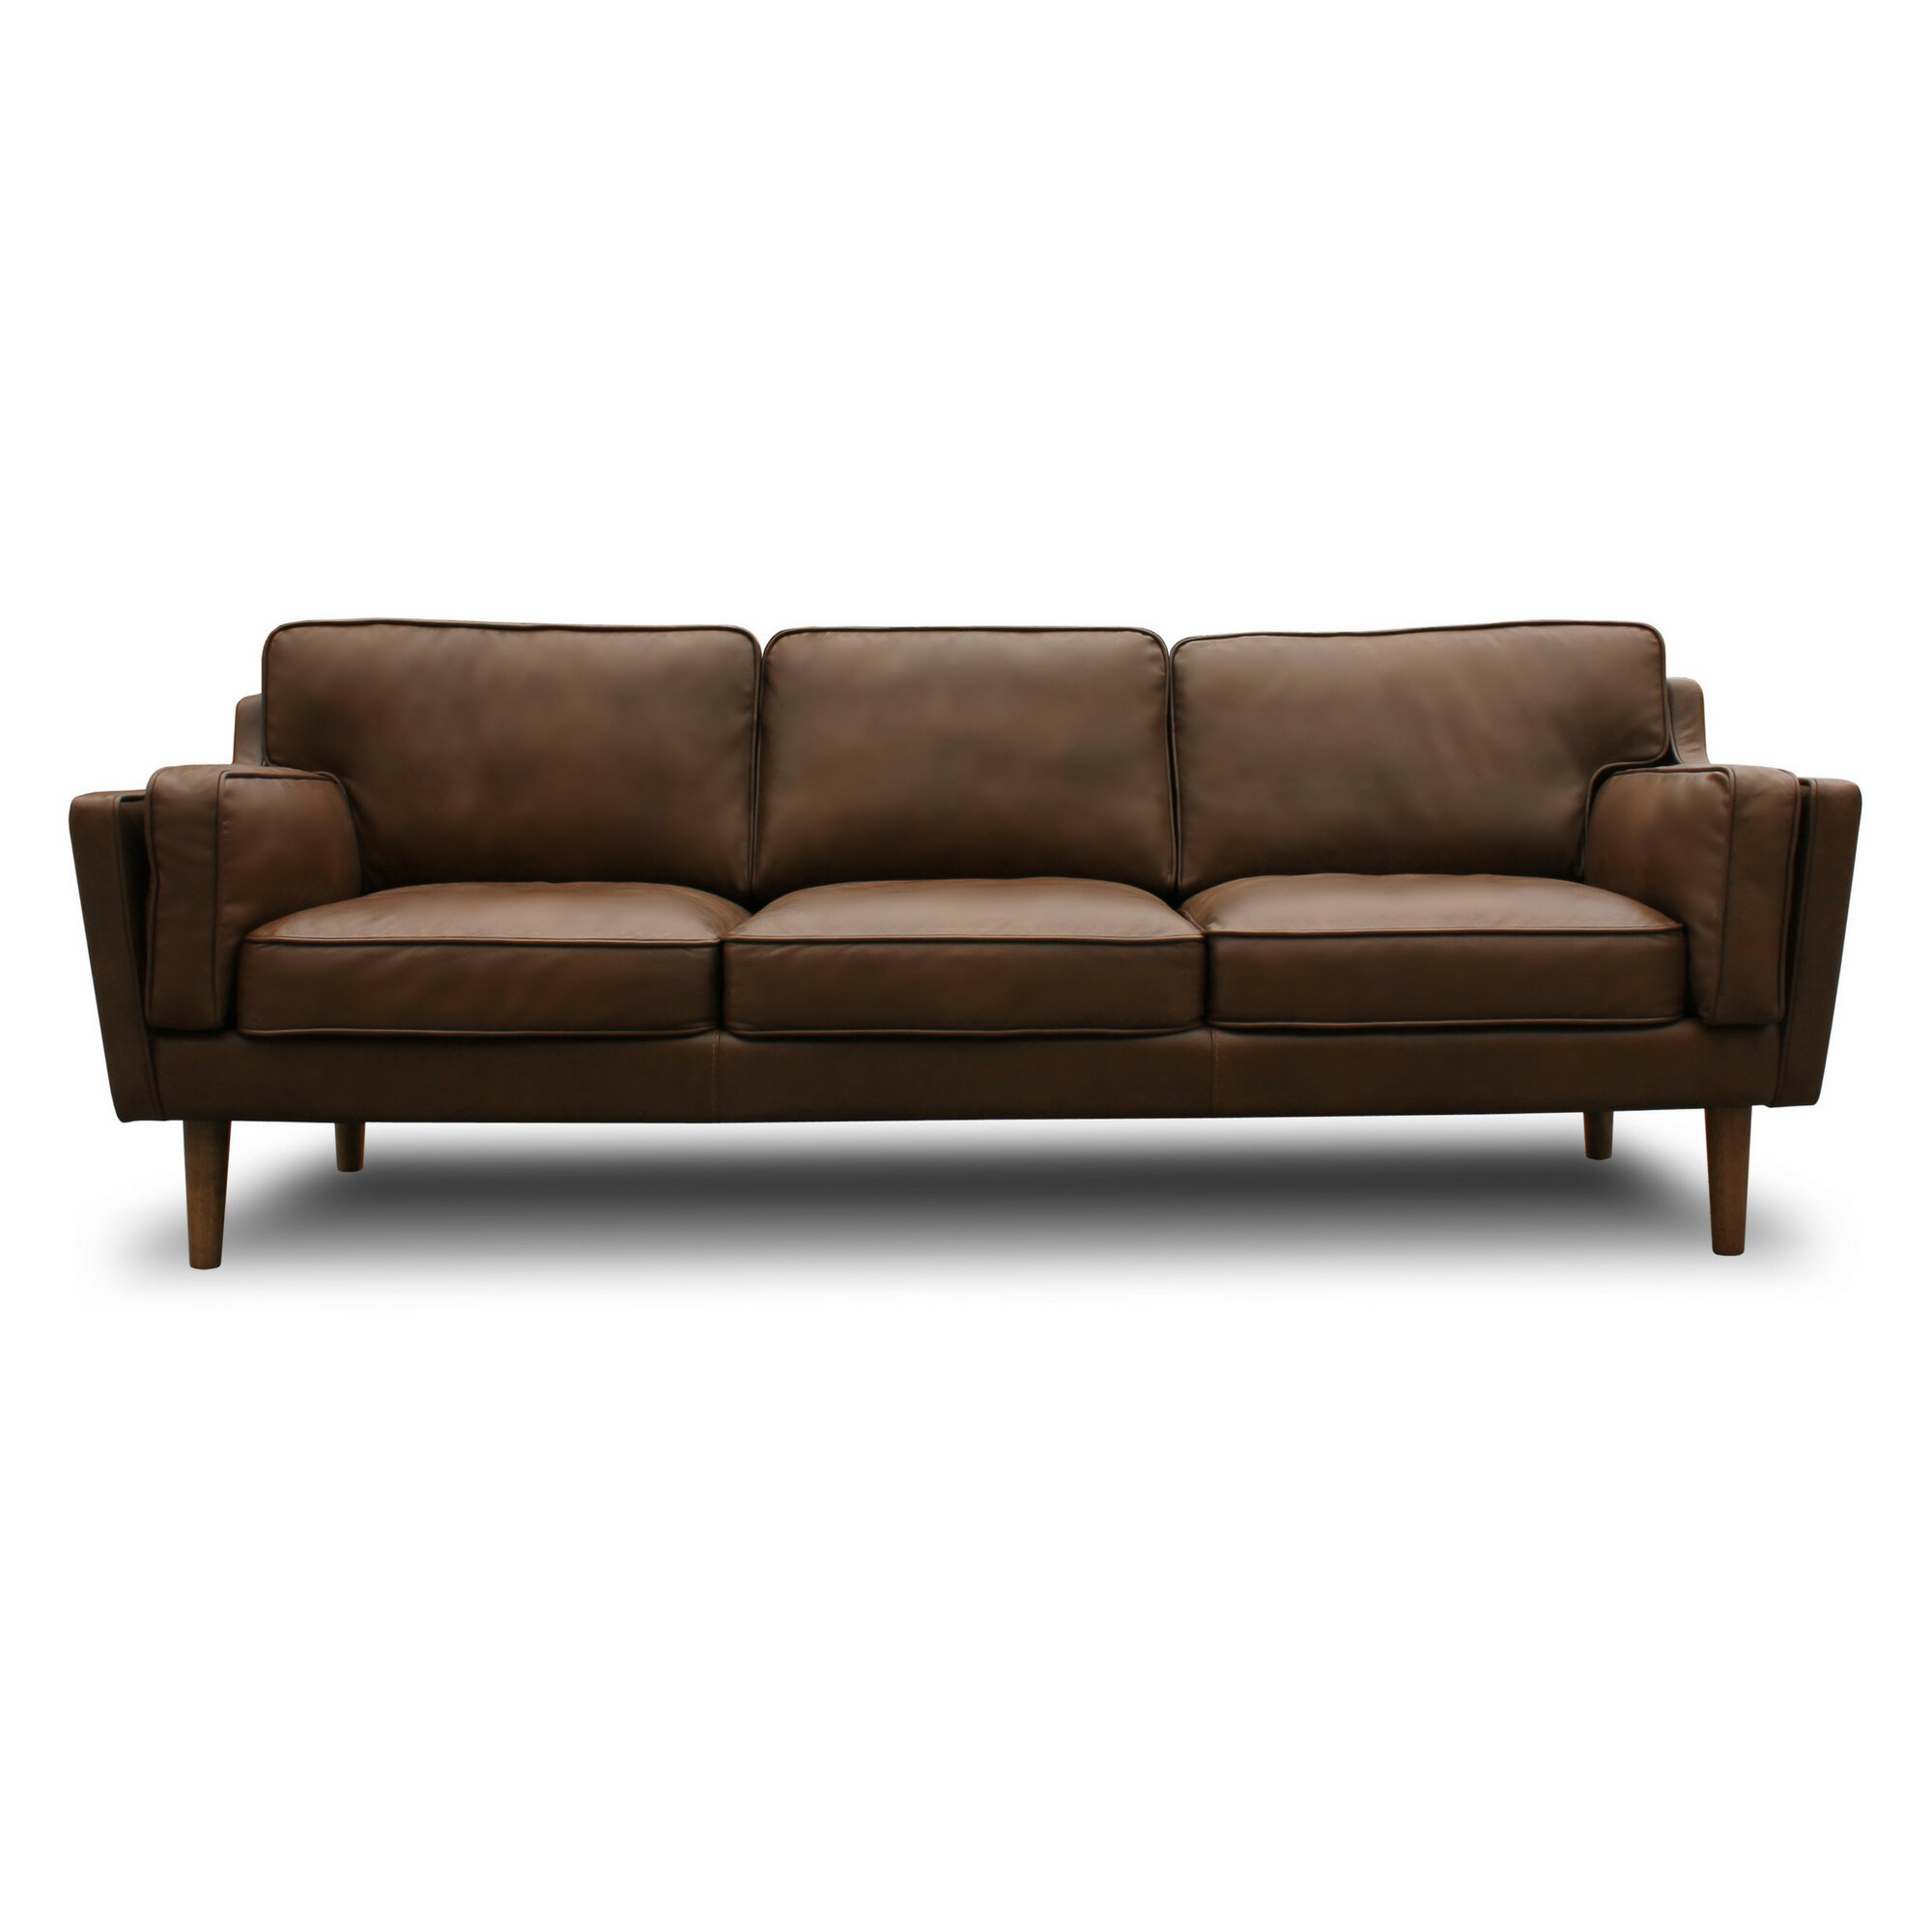 Italian Leather Sofas Contemporary Uk Yellow Sectional Sofa ...